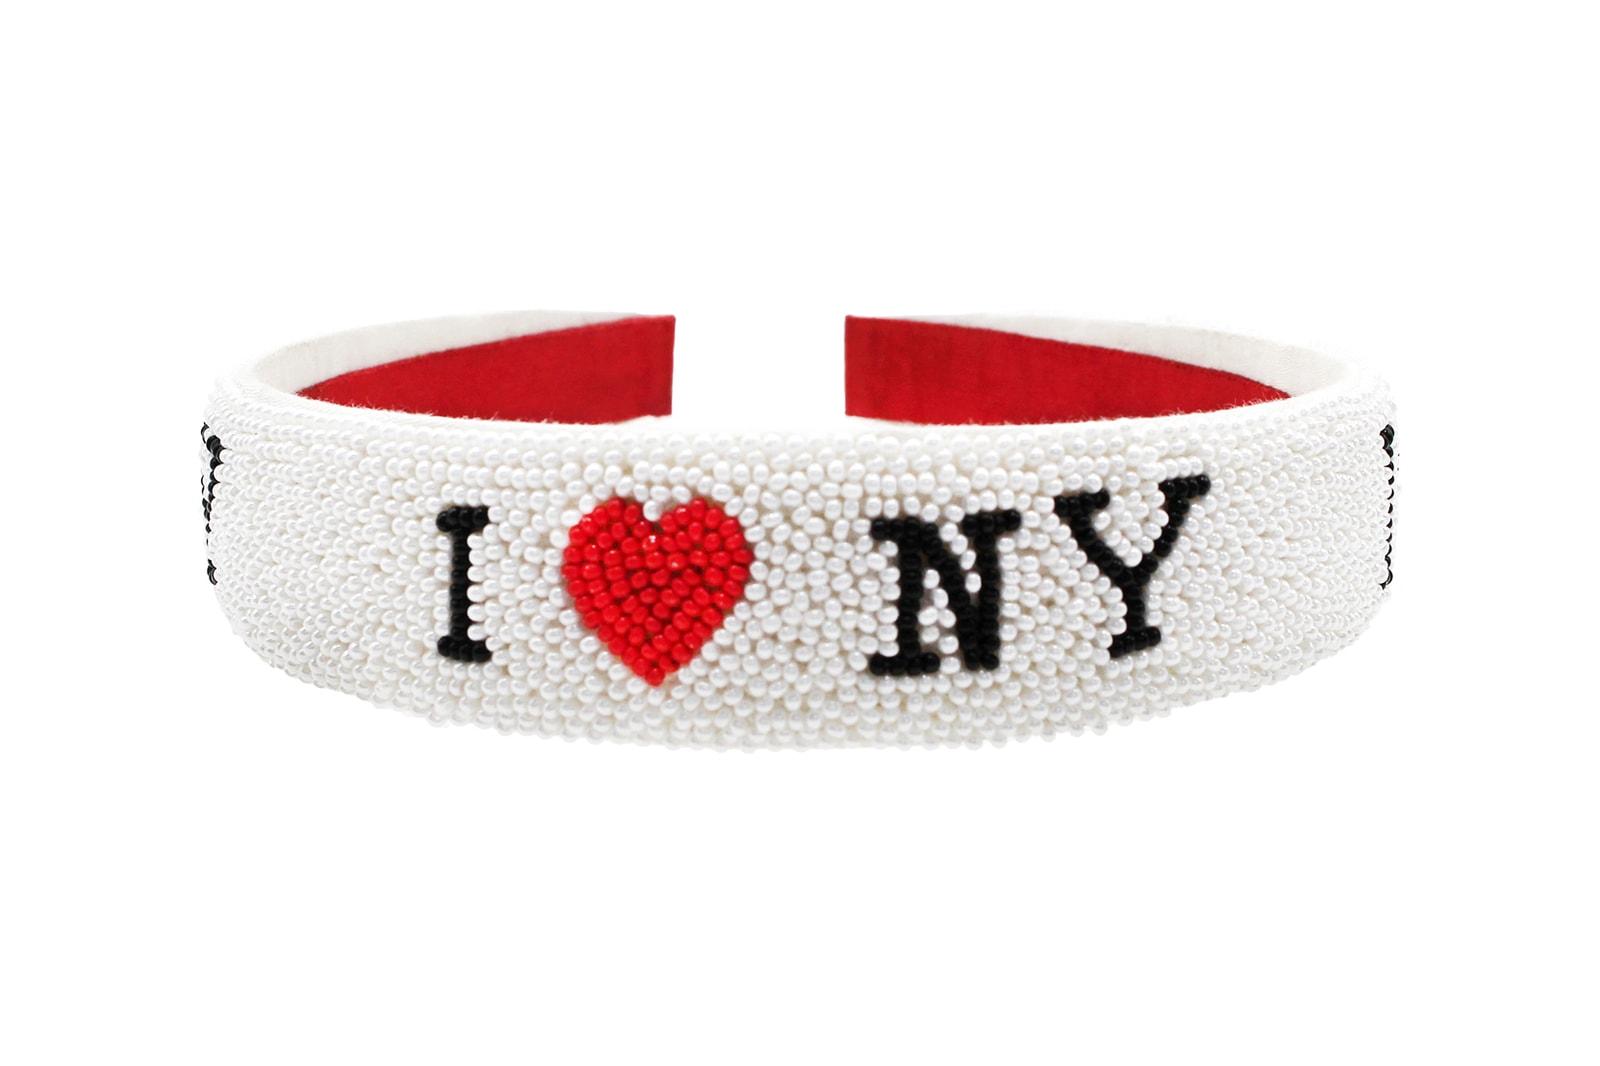 New York Fashion Week Street Style Headband 2019